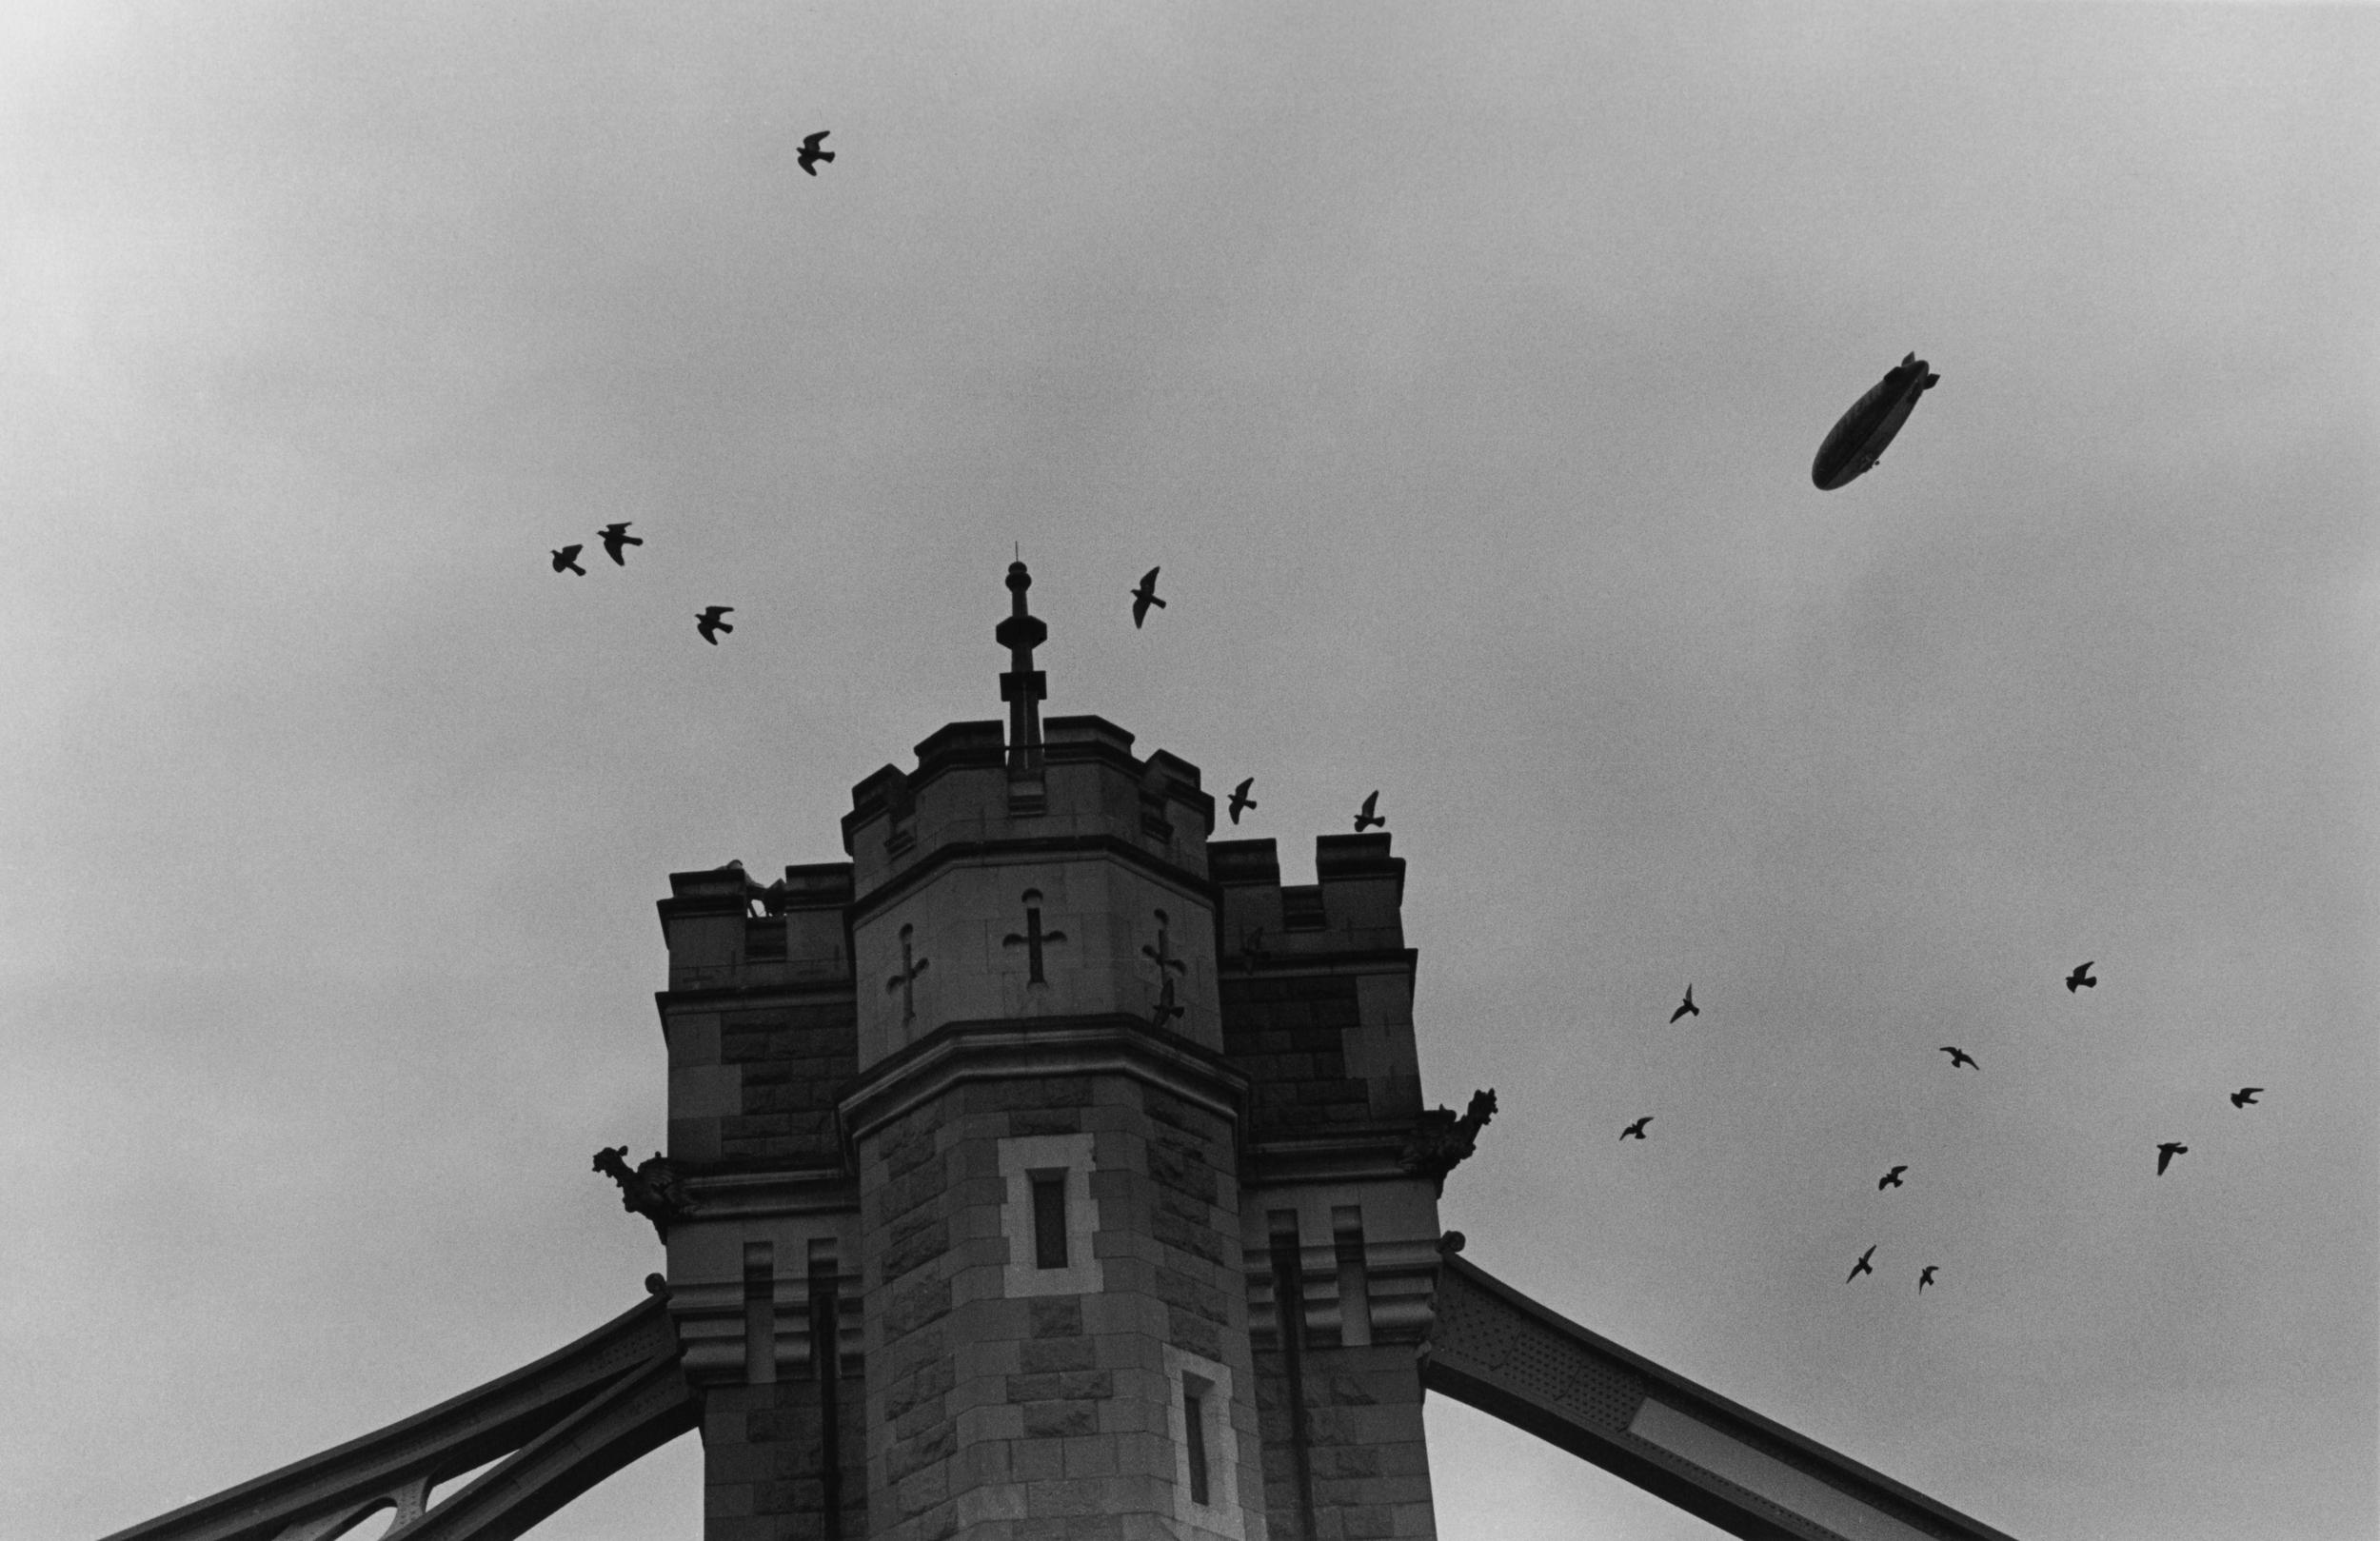 thetower.jpg